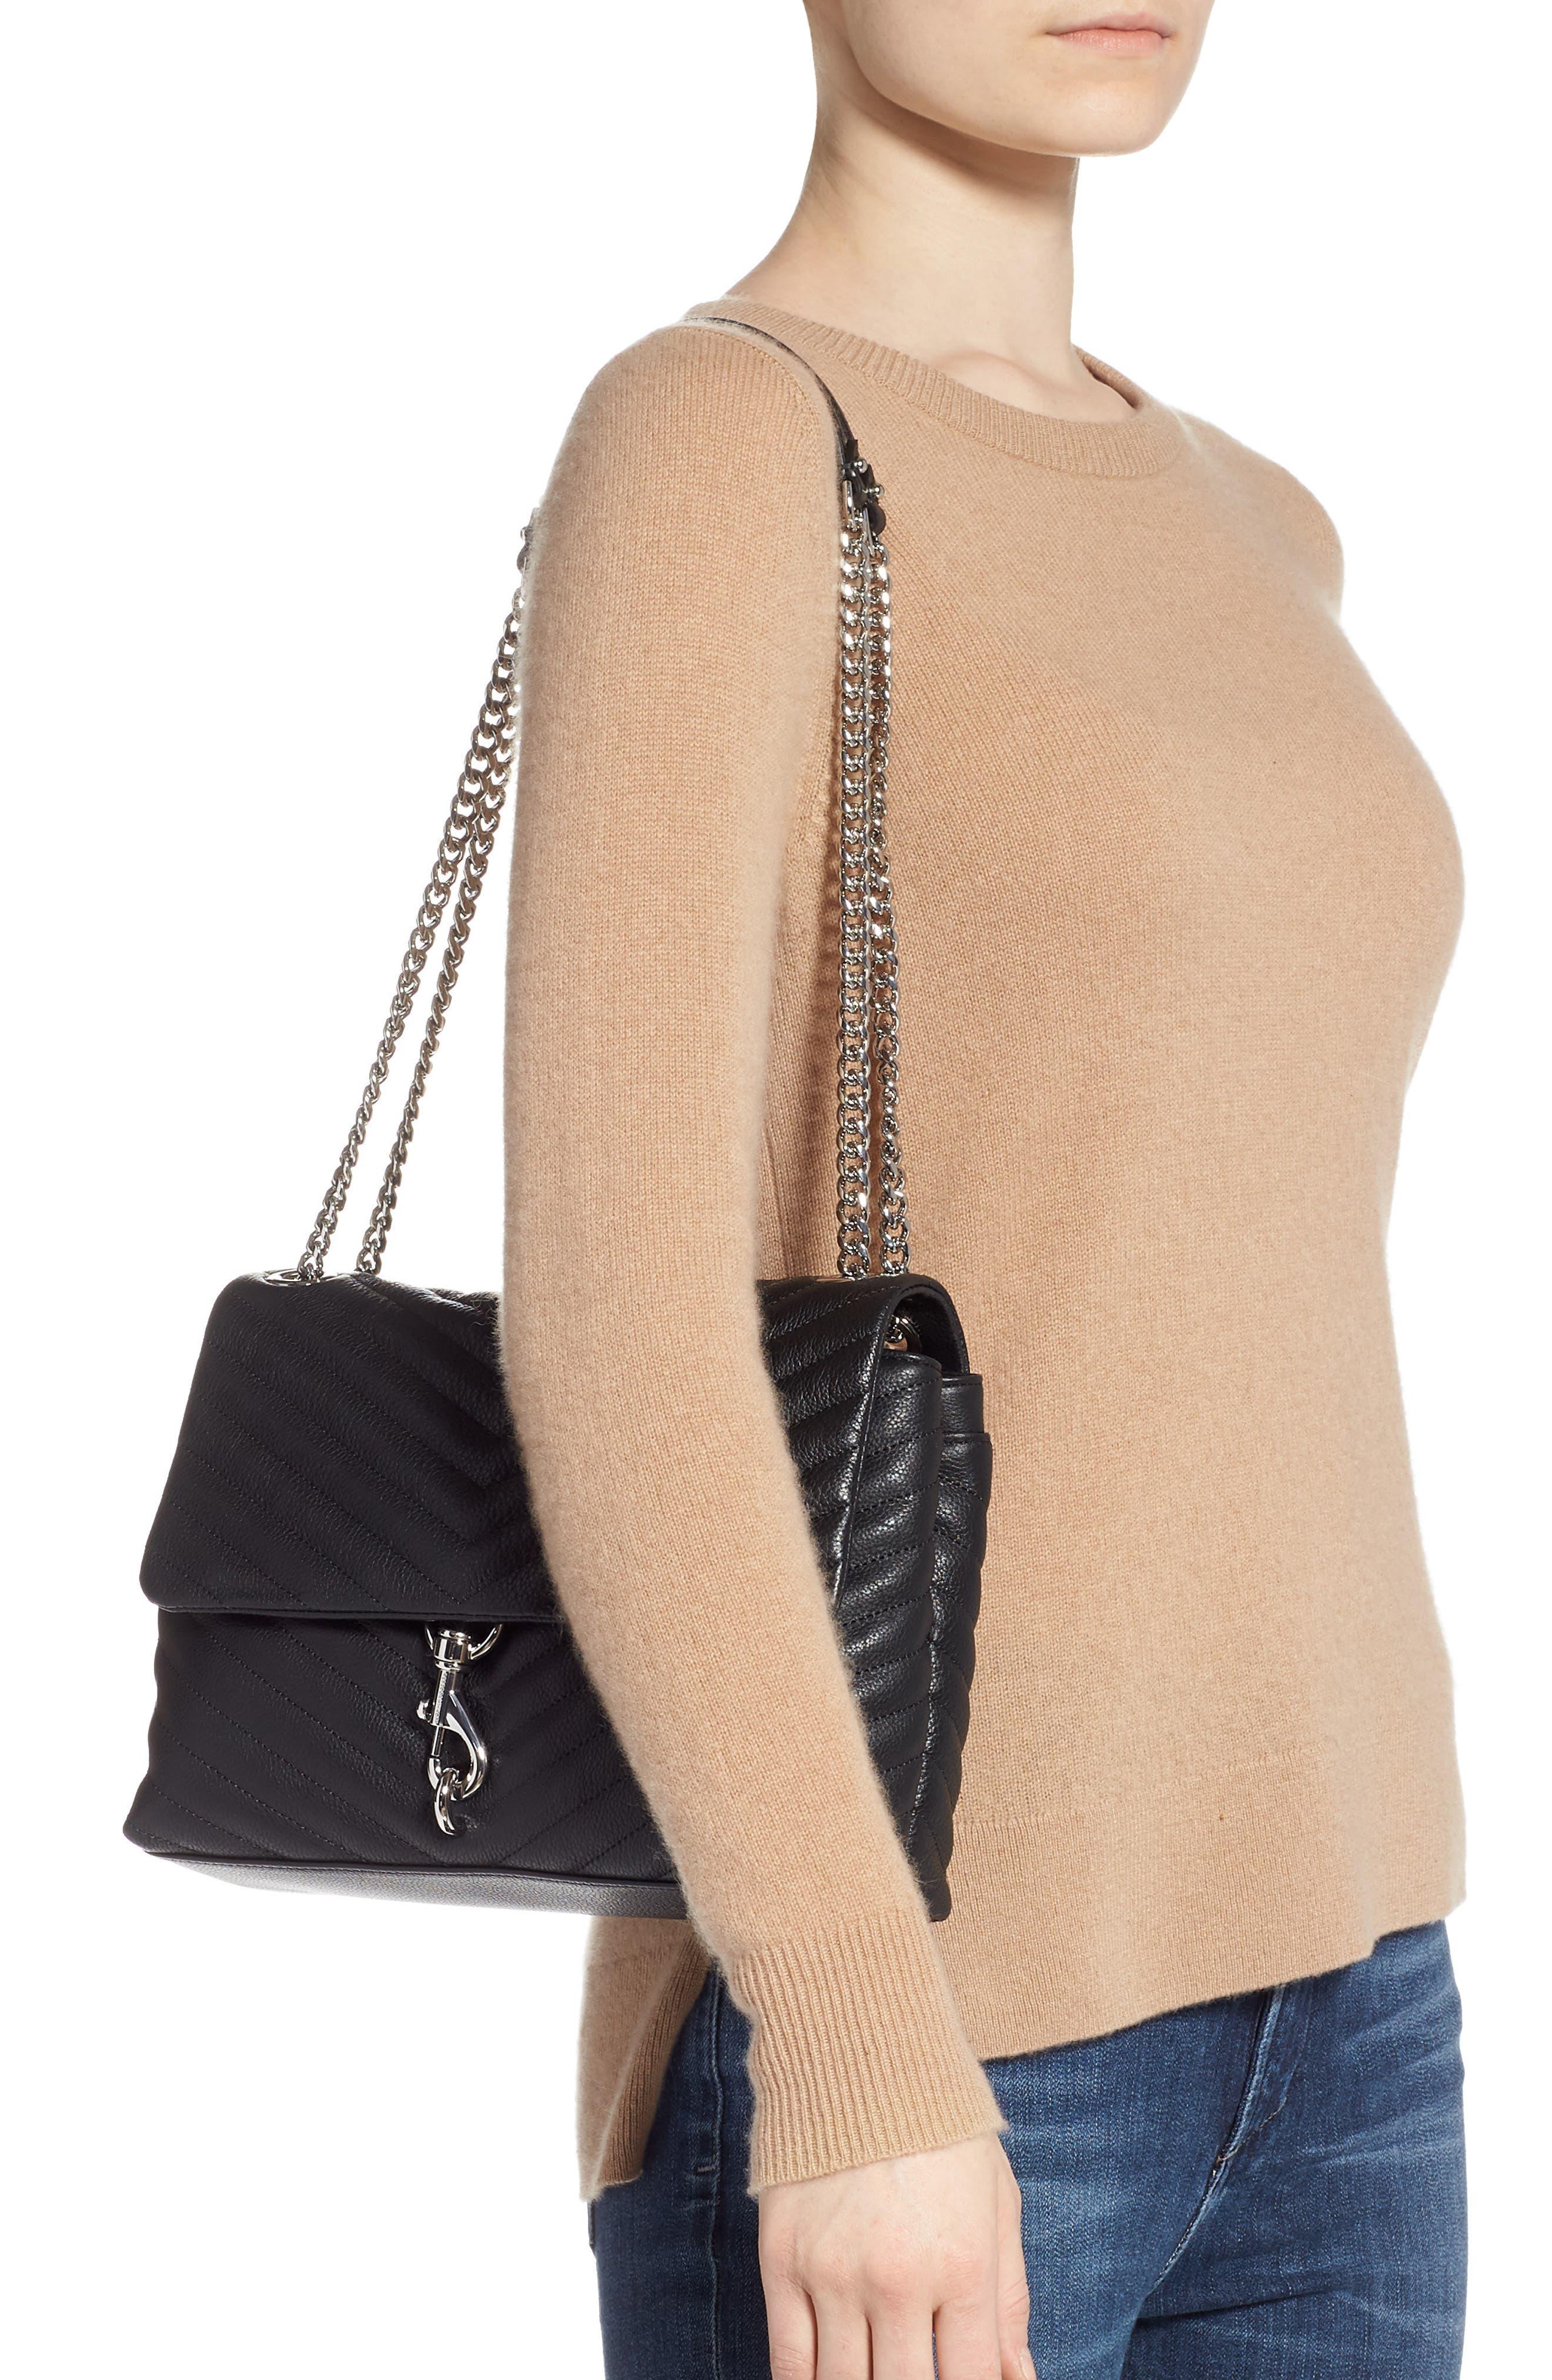 REBECCA MINKOFF, Edie Flap Quilted Leather Shoulder Bag, Alternate thumbnail 2, color, BLACK